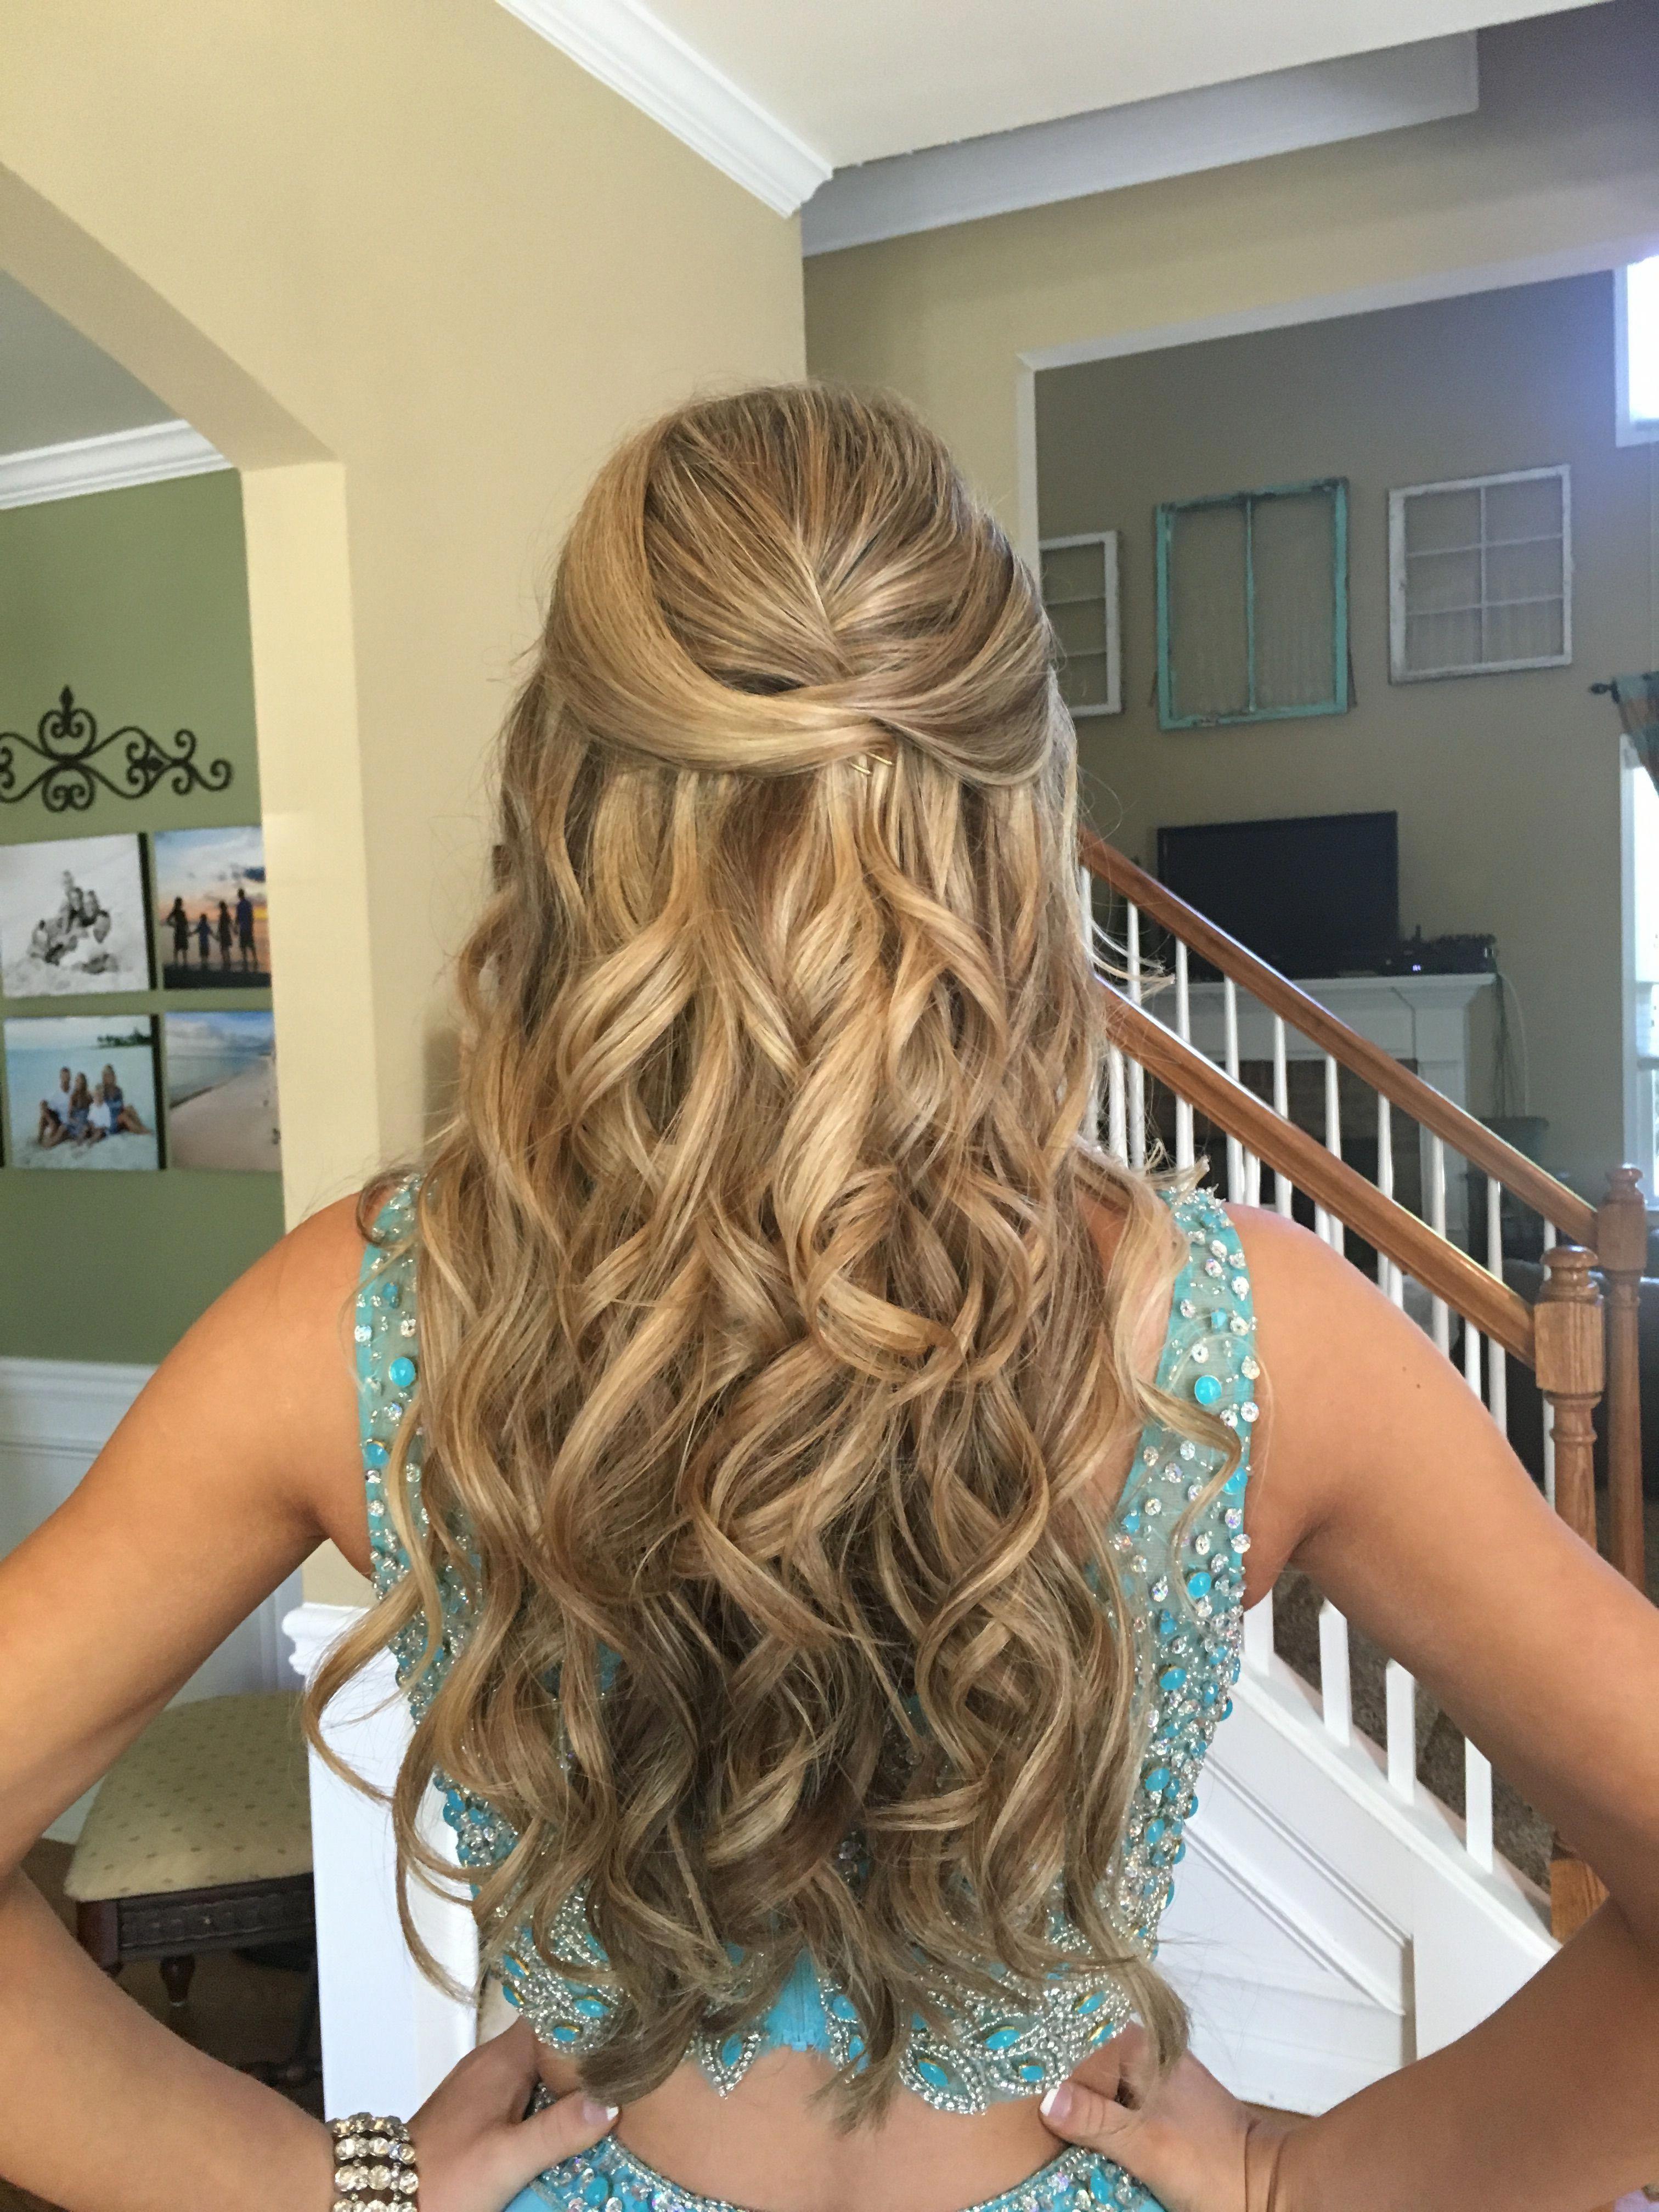 pincorrie kehrer on hair  down hairstyles long hair